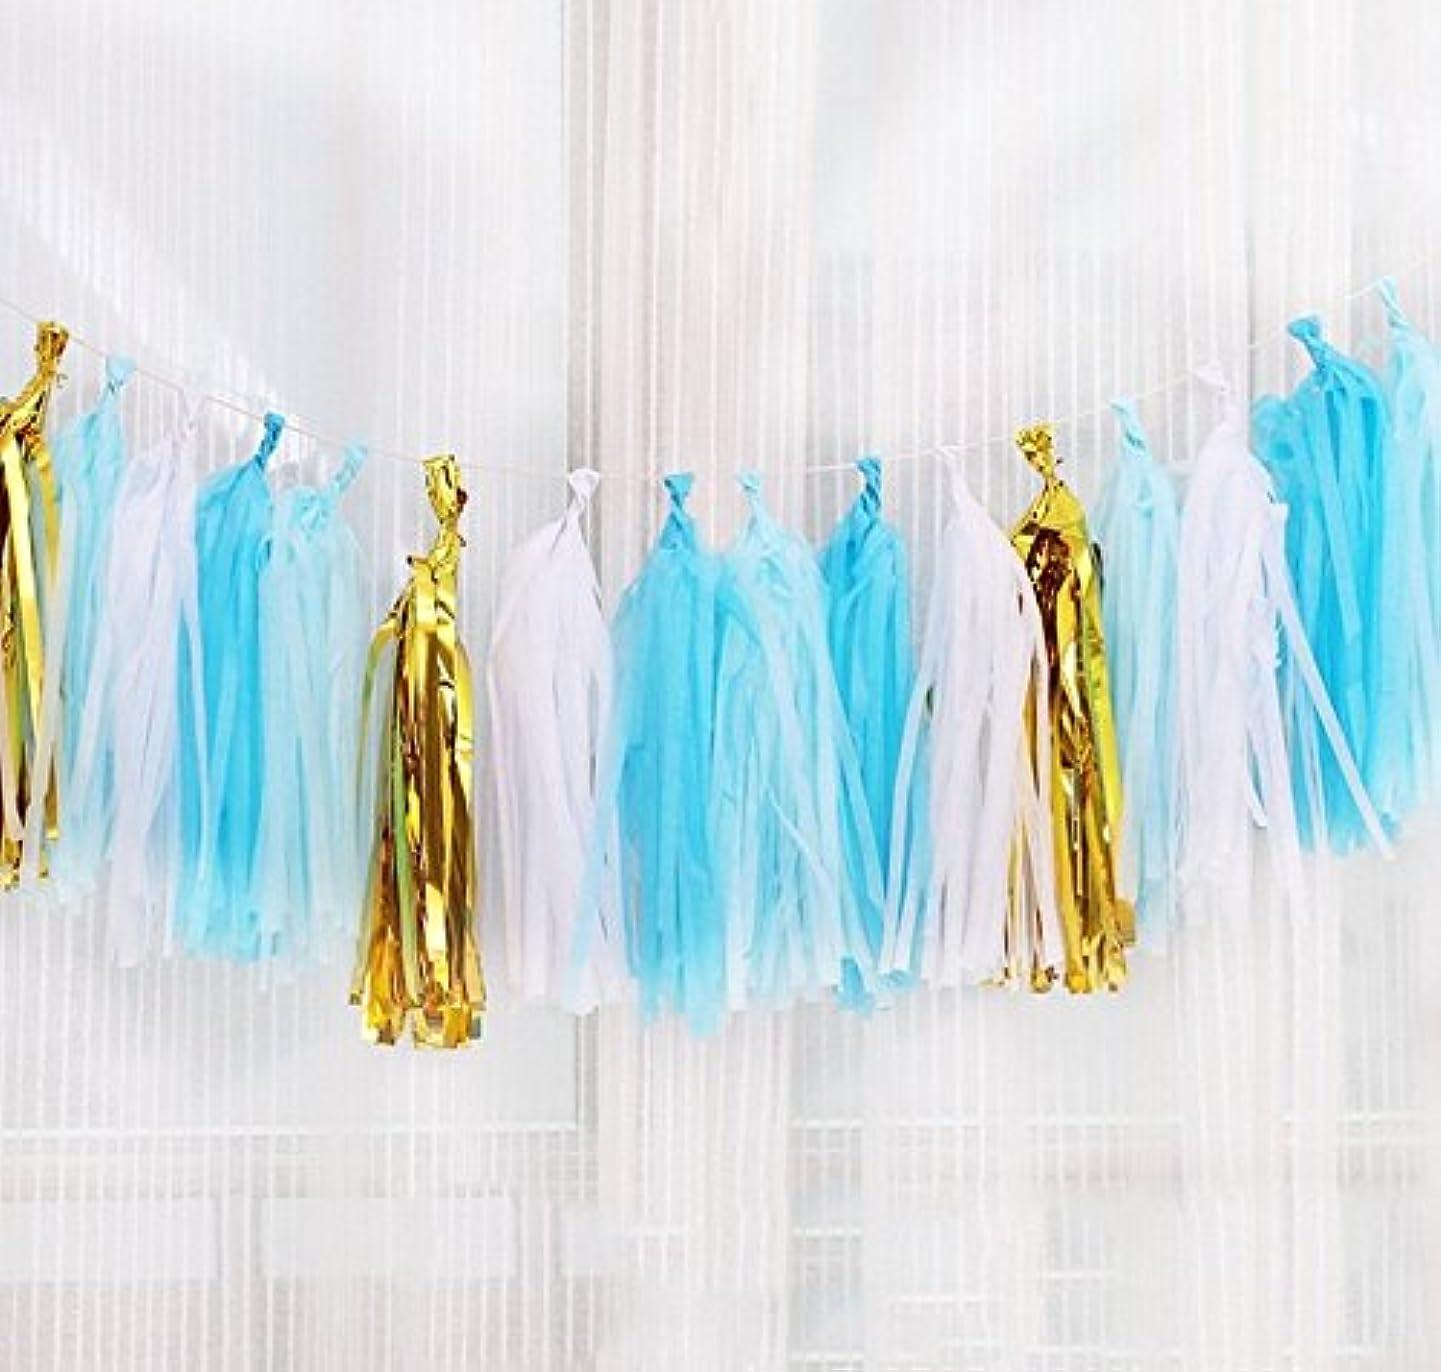 Premium Tissue Paper Tassels, Party Tassels DIY Garland Banner for Wedding, Baby Shower, Birthdays, Photo Props, Event and Party Supplies DIY Kits (Blue+ White)